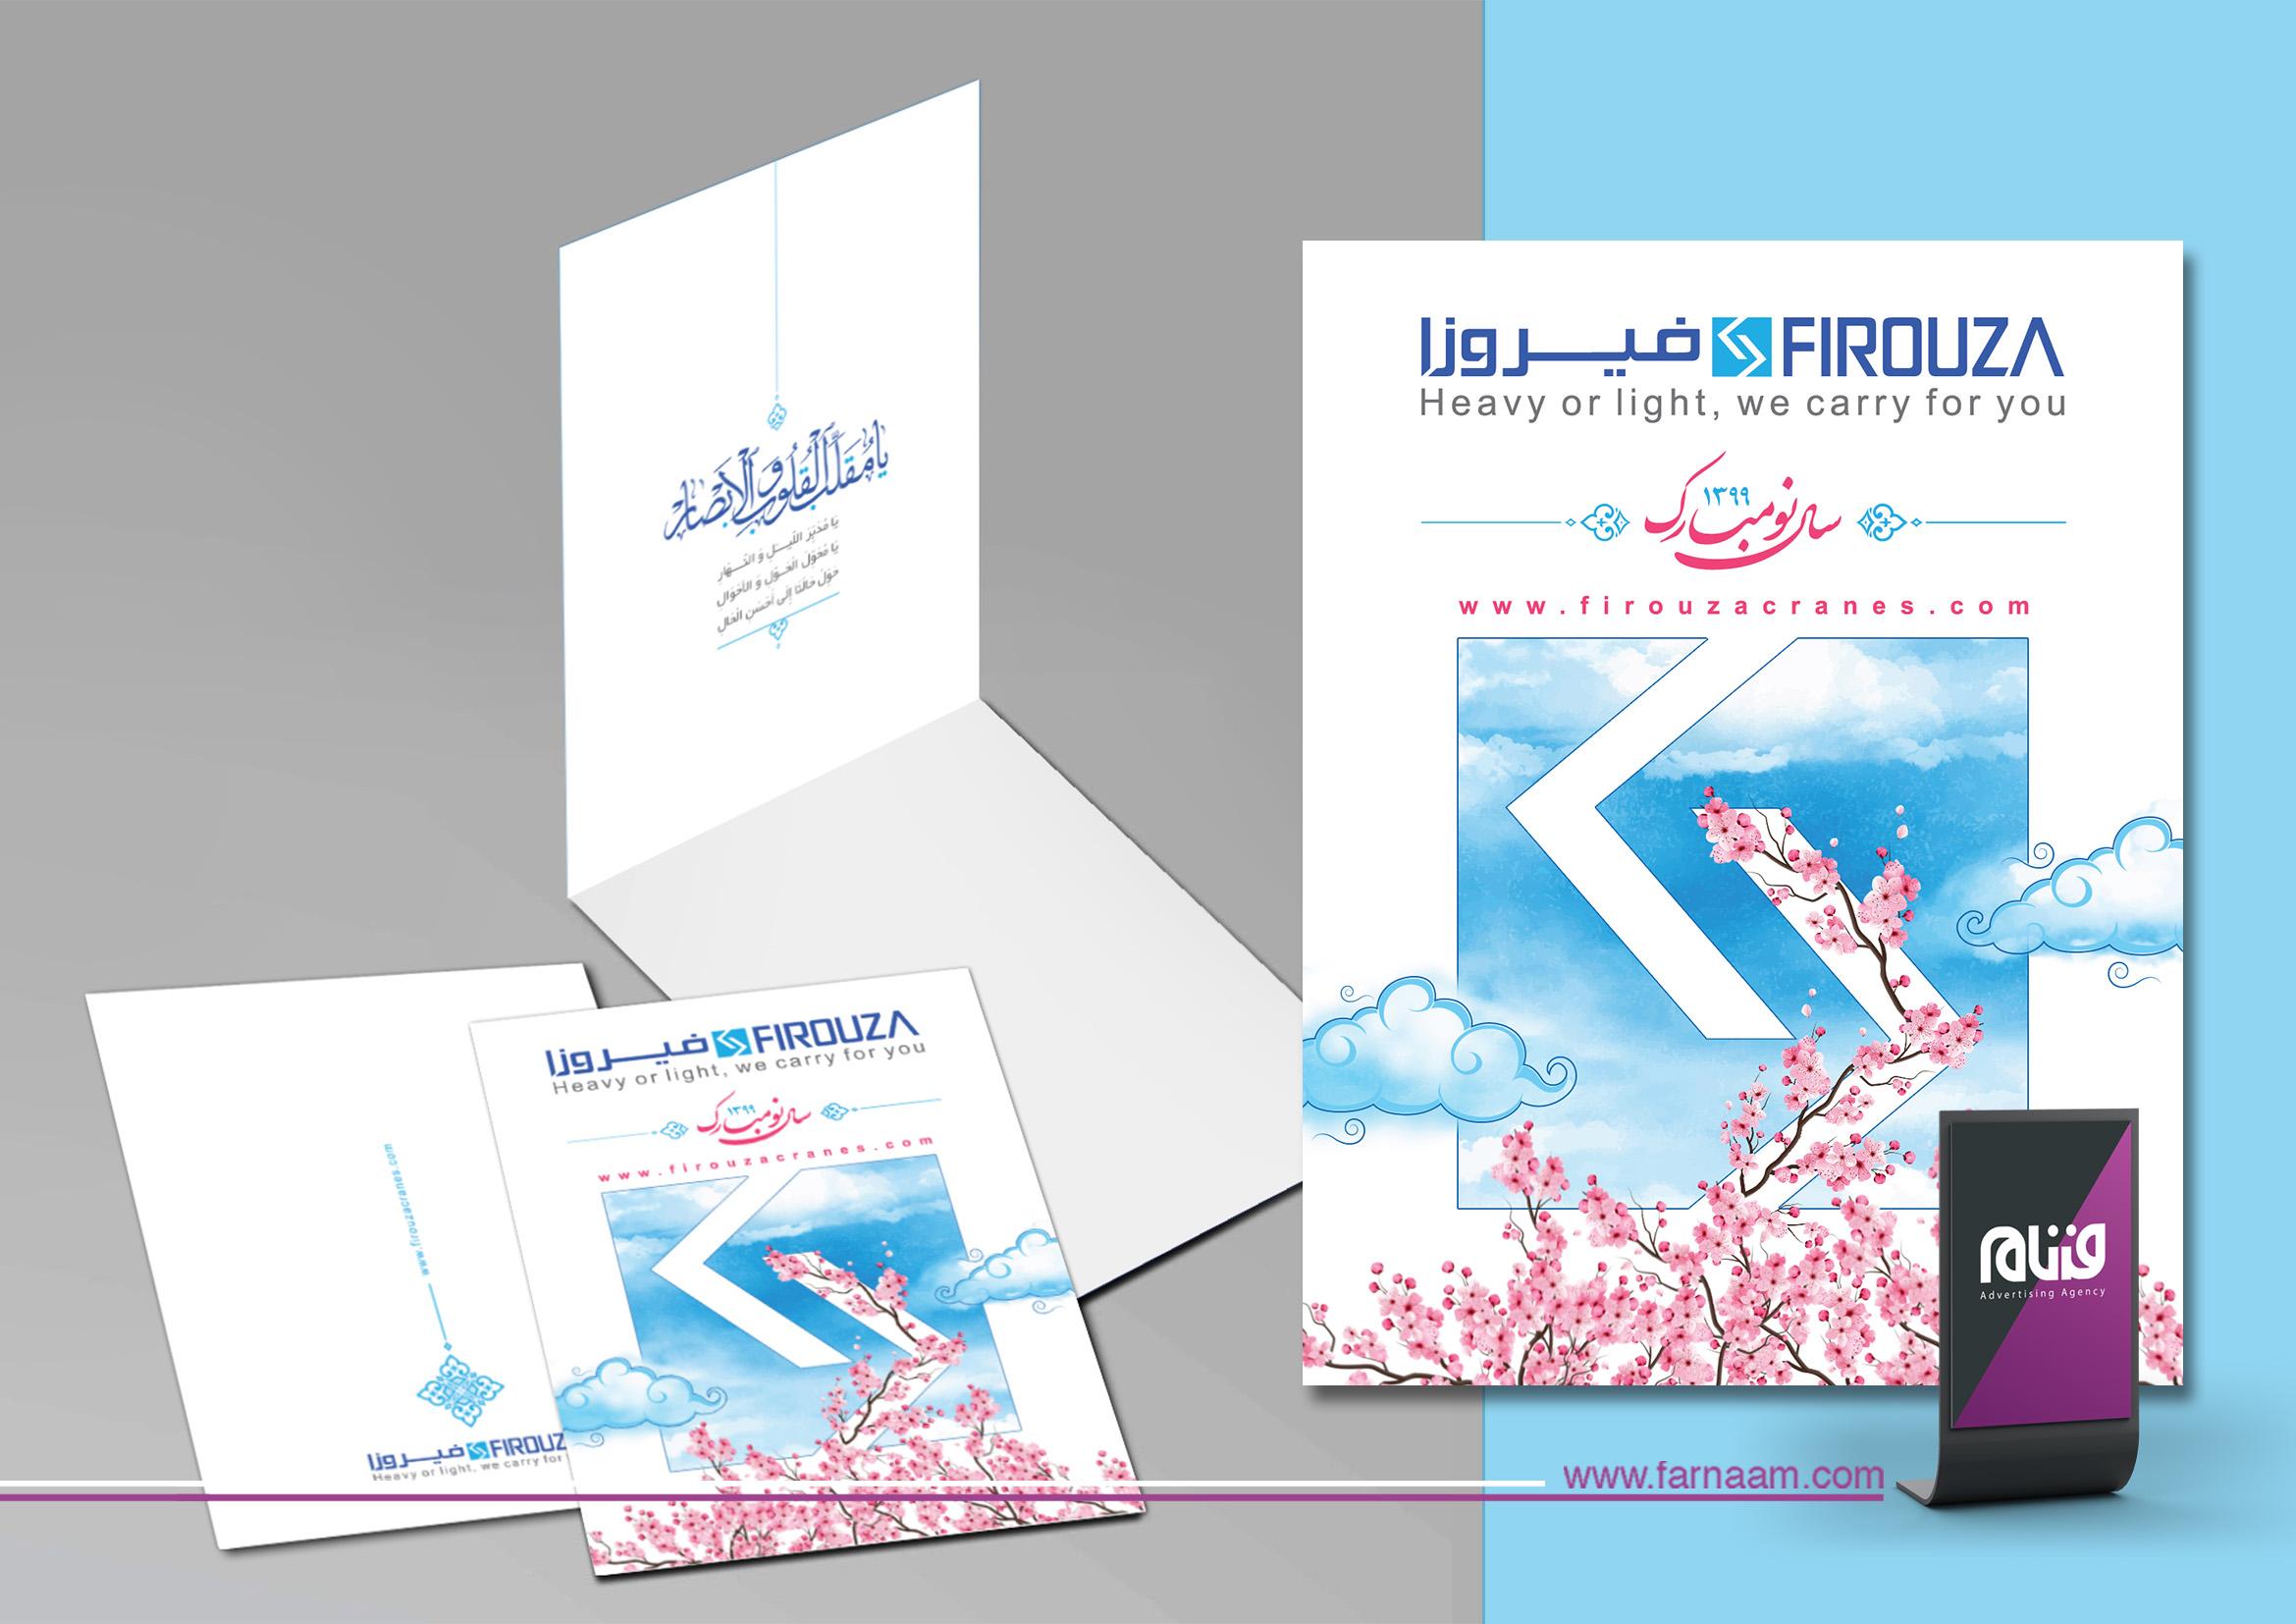 طراحی کارت پستال فیروزا